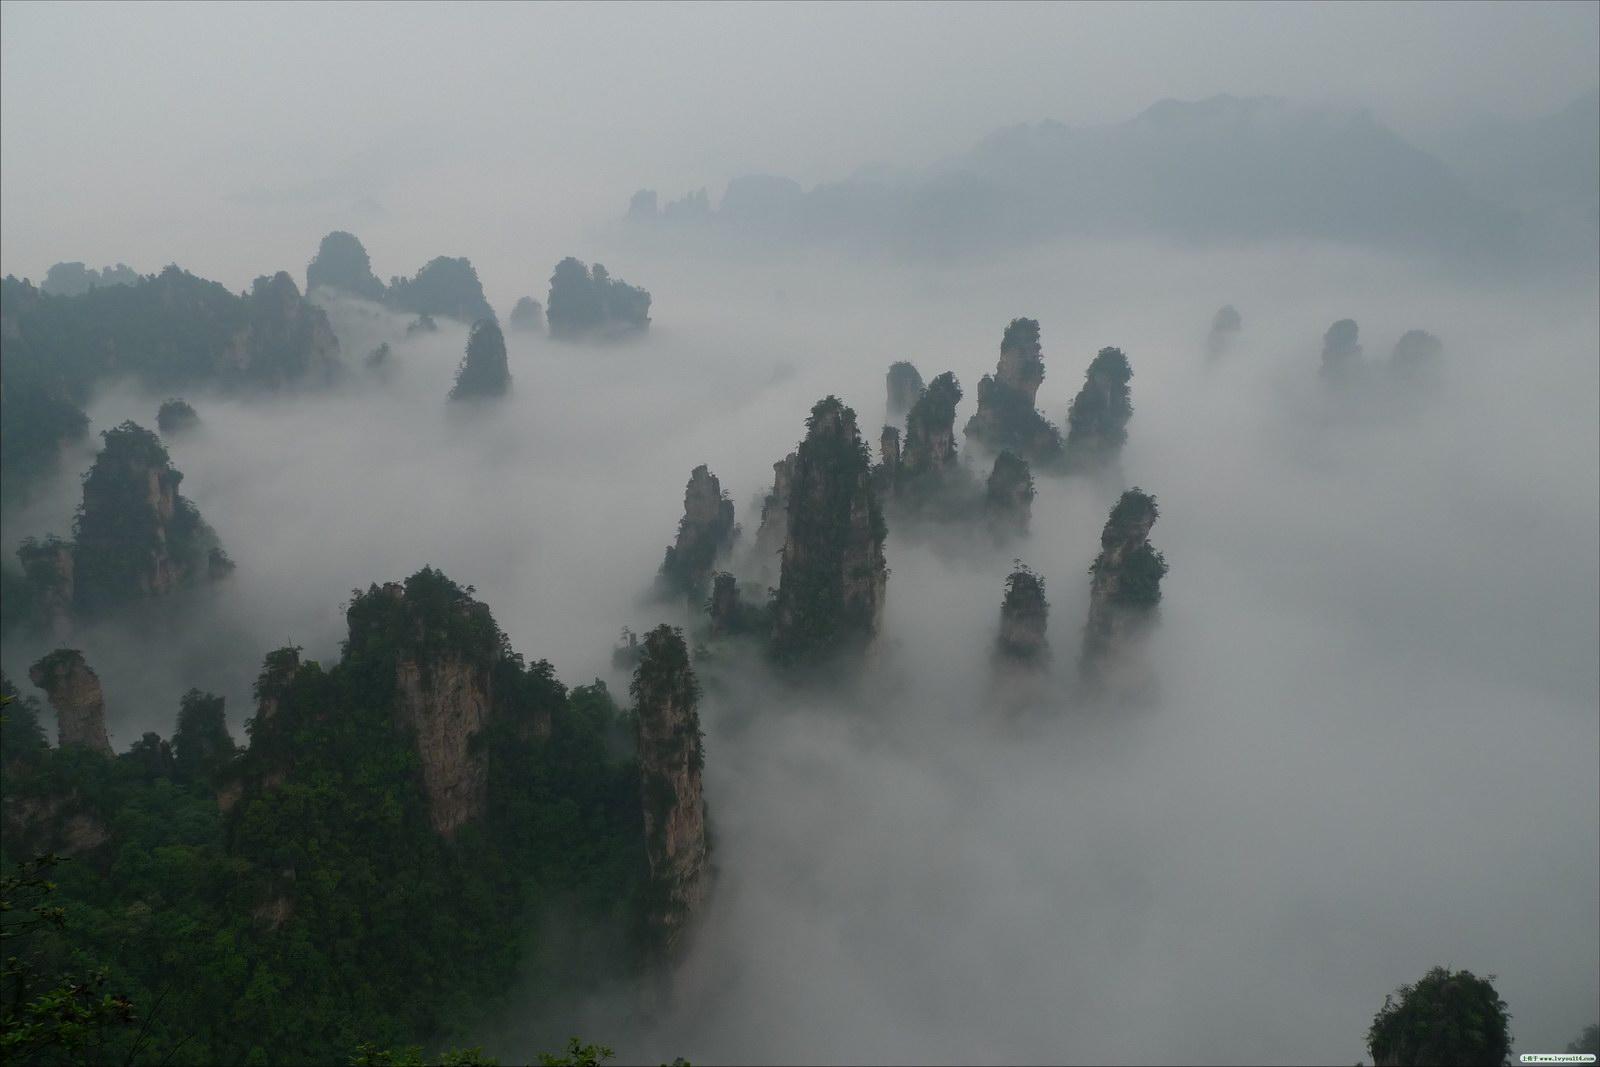 Mist, Zhangjiajie National Forest Park, China